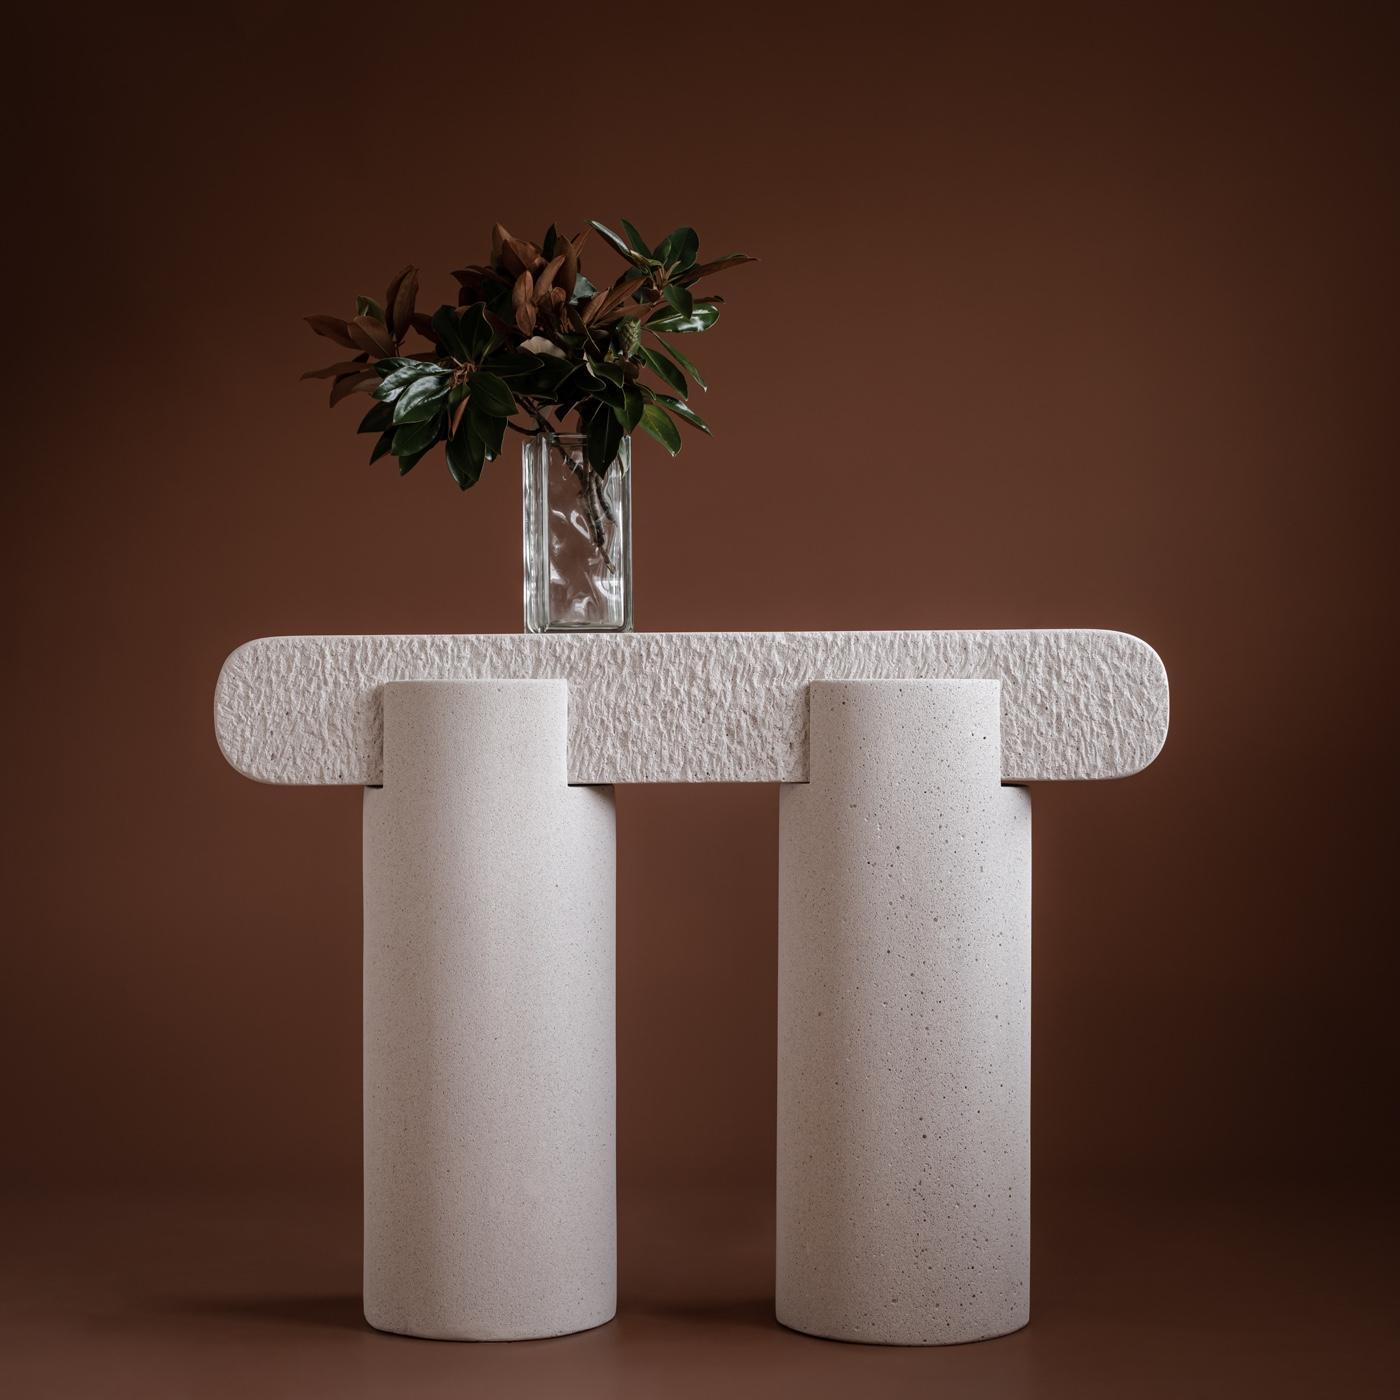 Sculpturale Meubels-Image-5